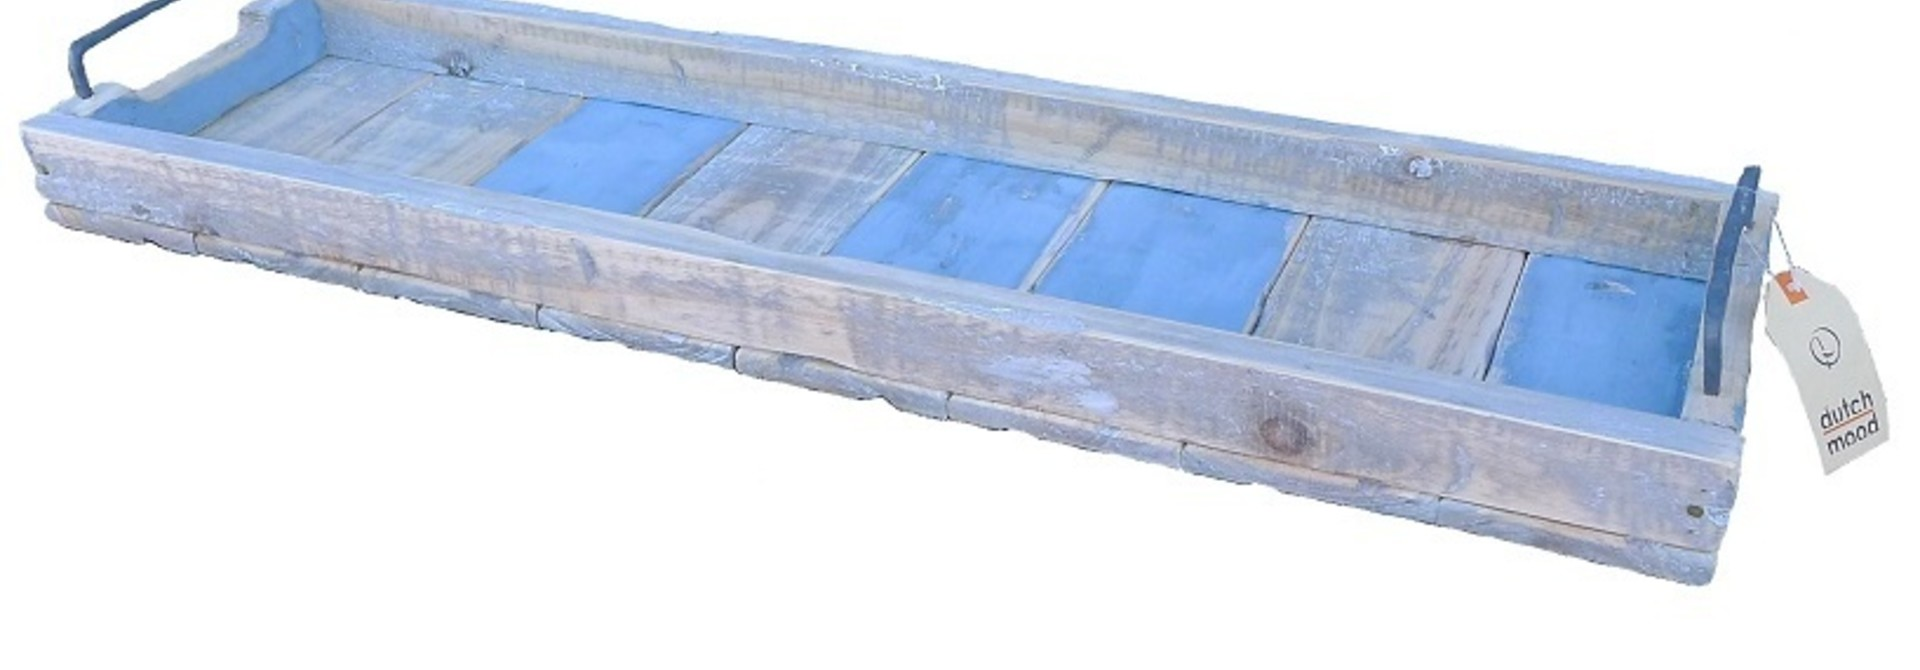 Tablett rechteckig blau - 98/20